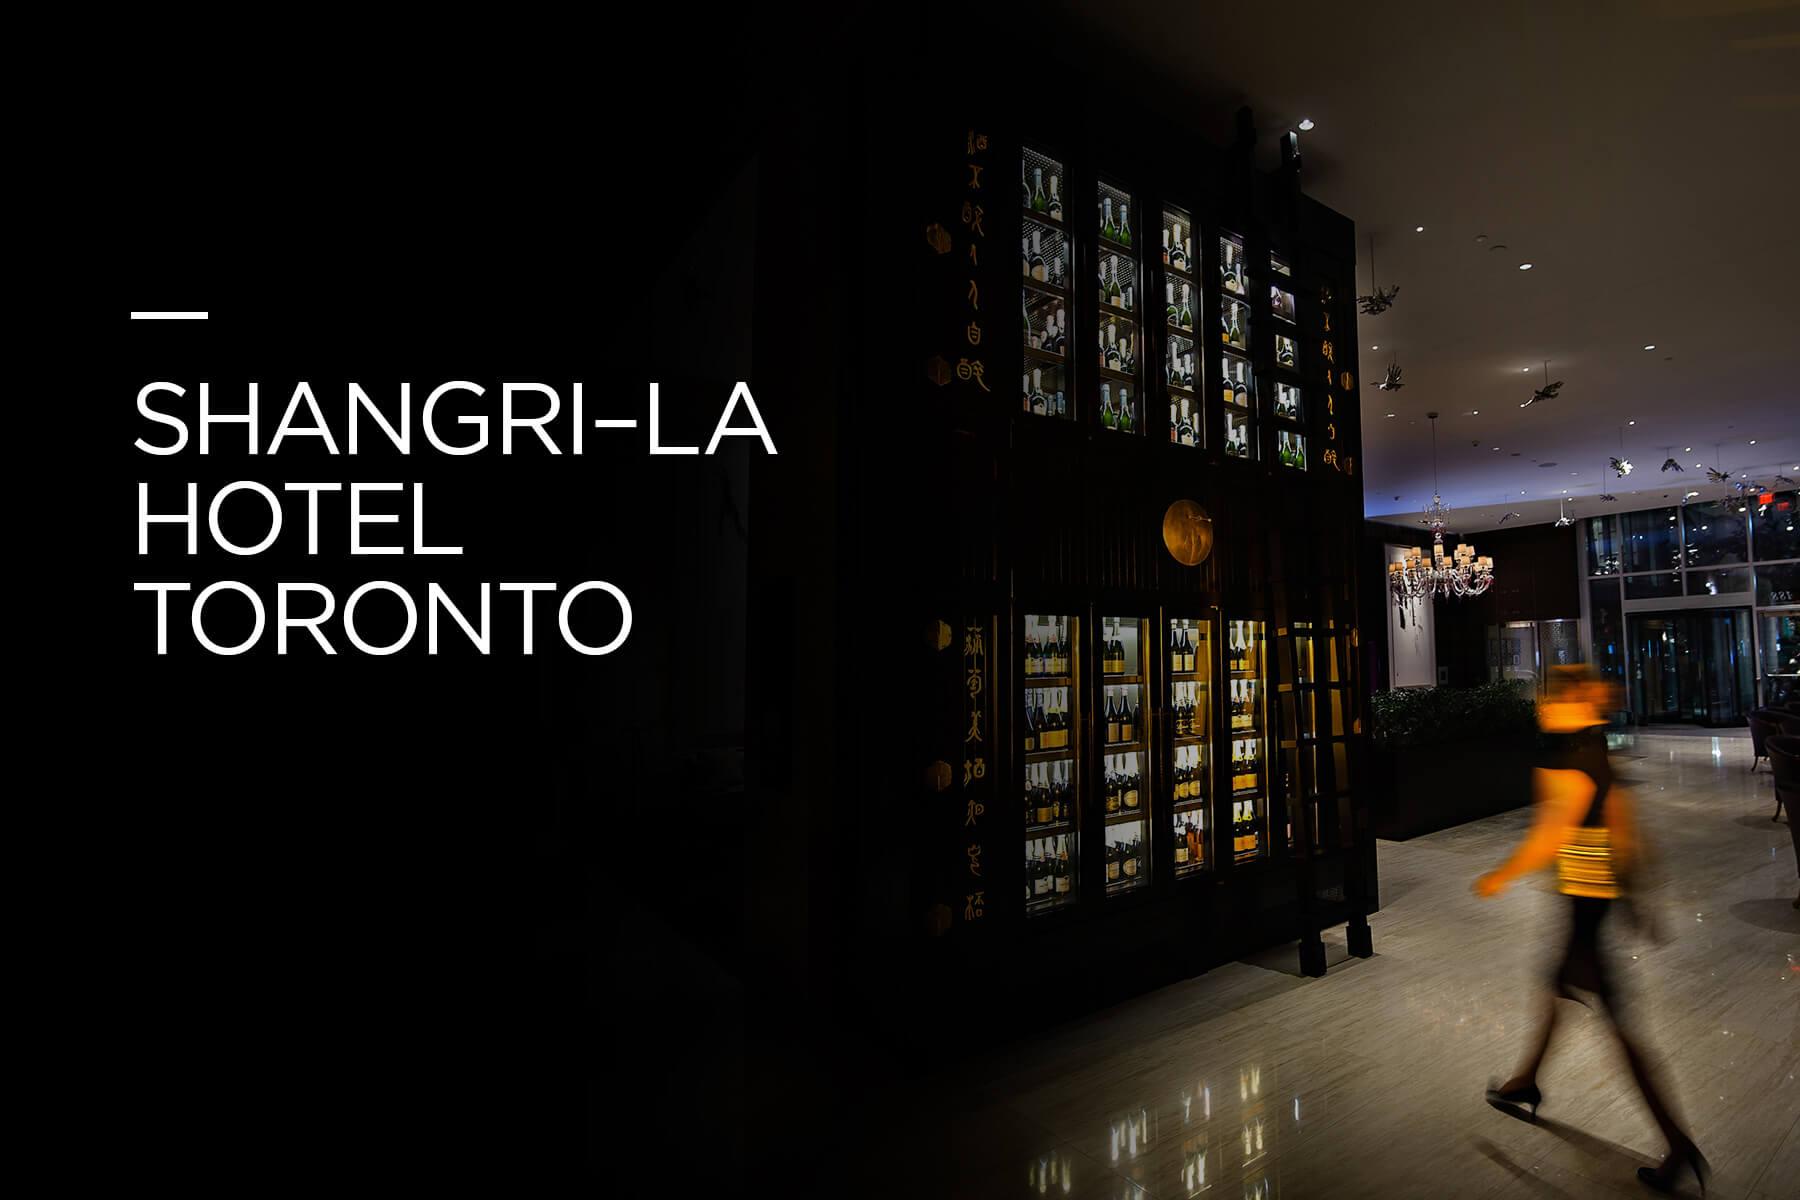 Shangri-La Hotel x VAWK